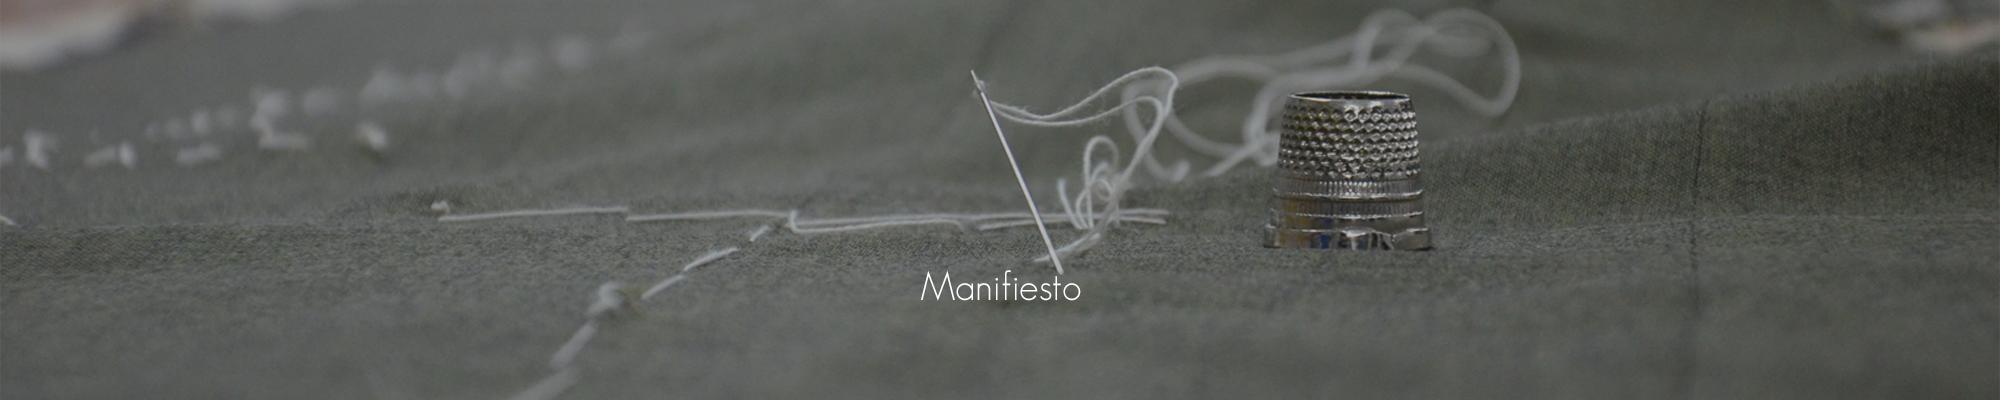 slide-manifiesto